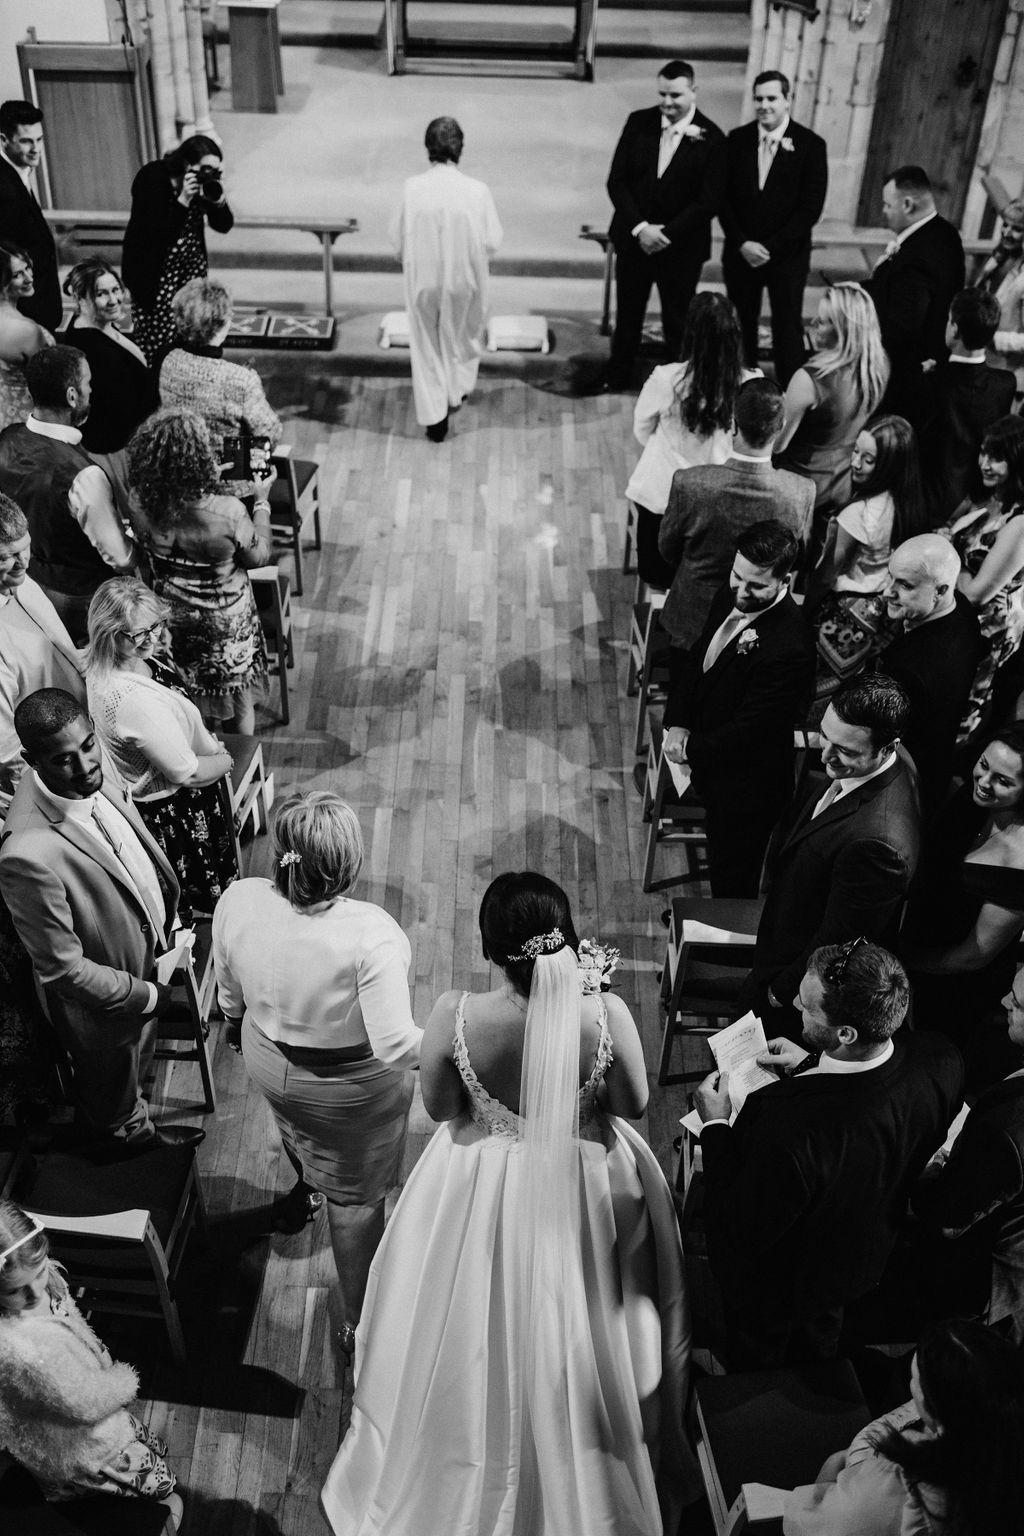 Your_Wedding_Day_065.jpg